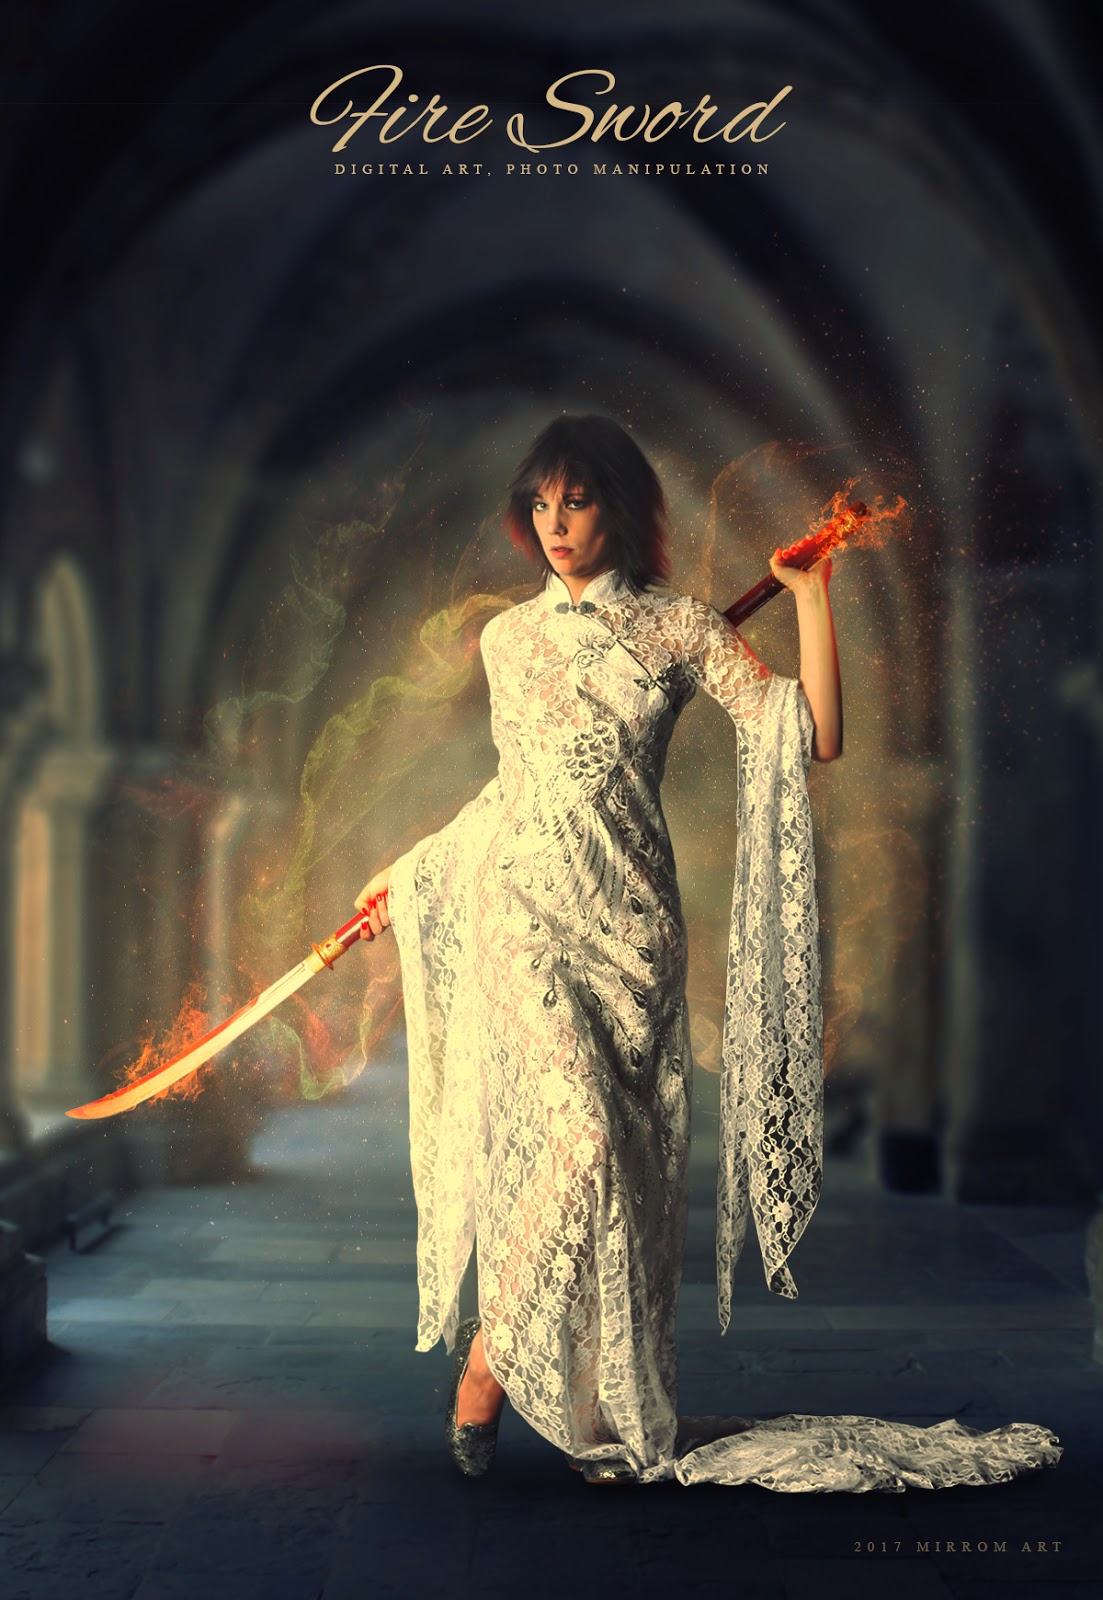 Fire Sword Fantasy Art Photo Manipulation In Photoshop